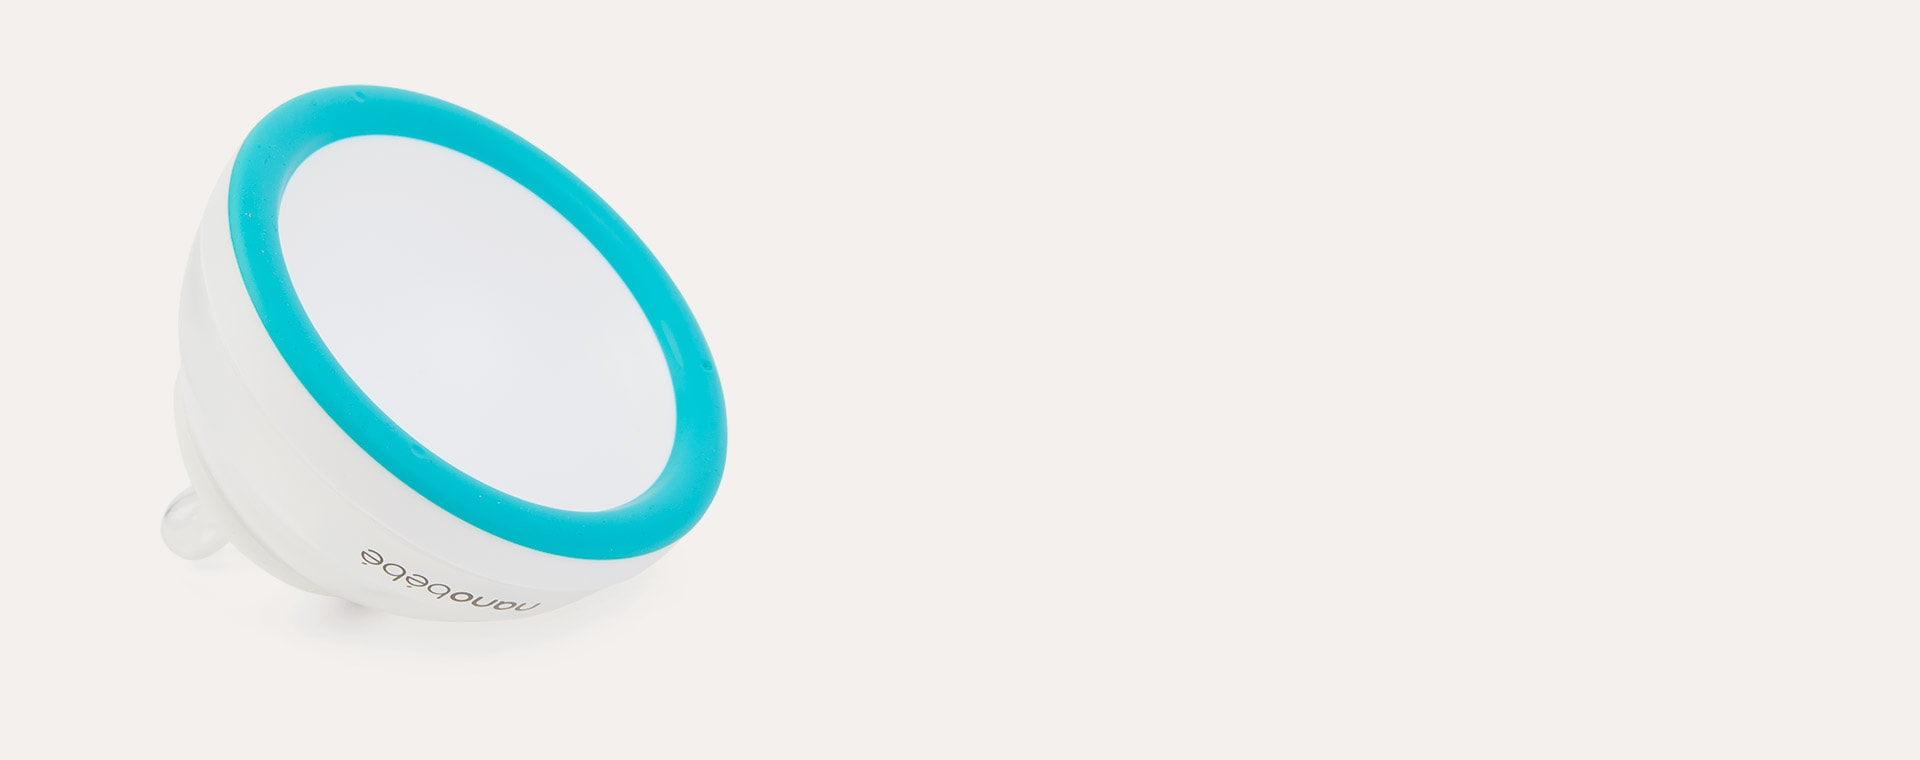 Teal nanobébé Breast Milk Bottle 3 Pack